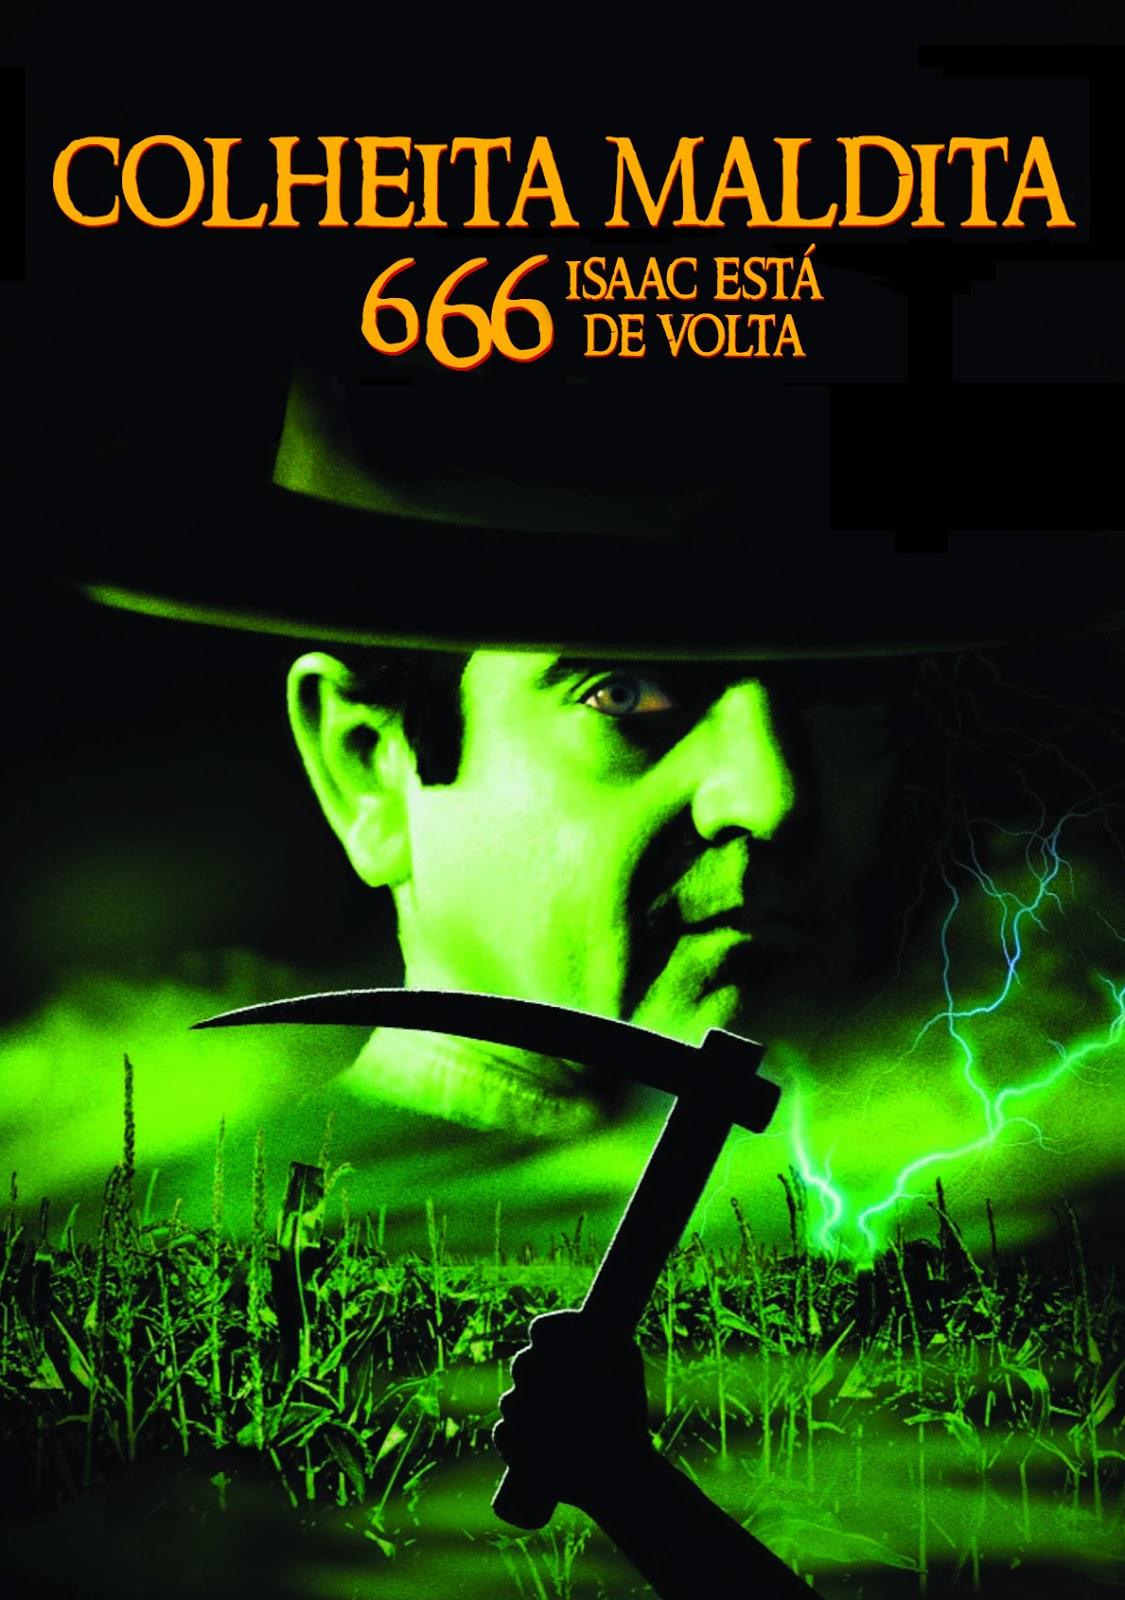 Colheita Maldita 666: Isaac Está de Volta Dublado